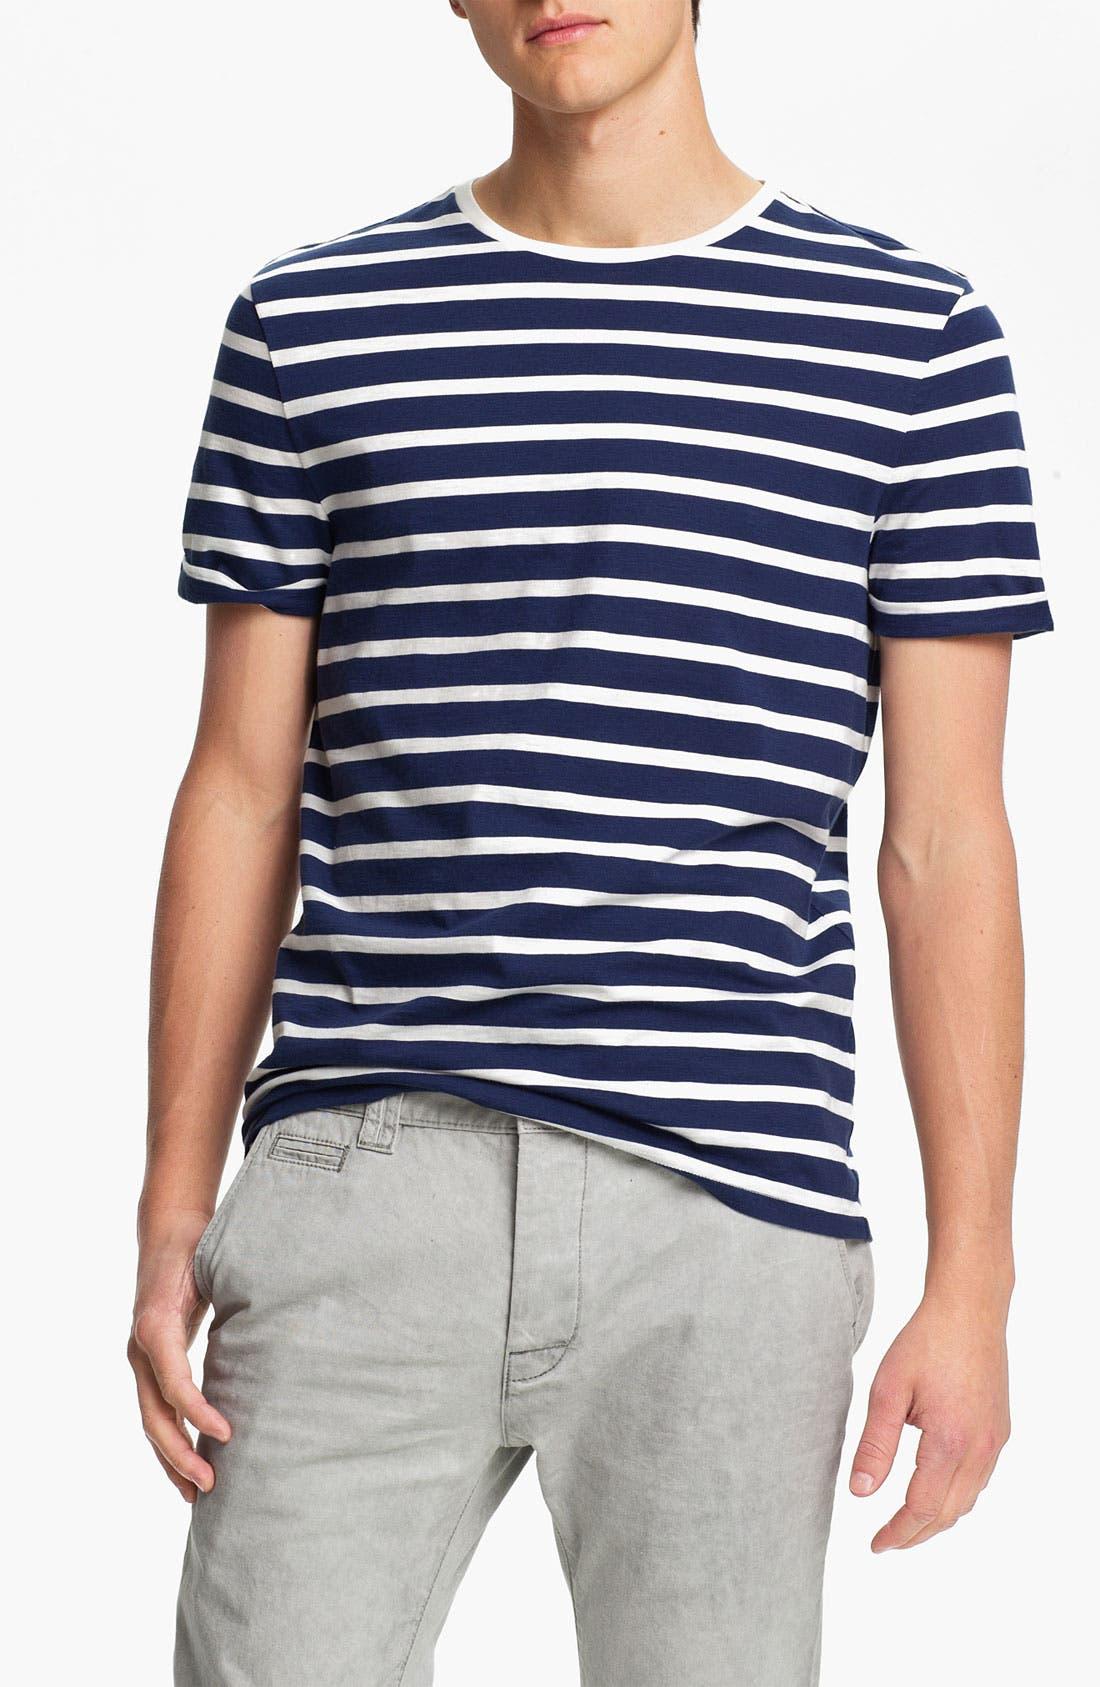 Main Image - Topman 'High Roller' Sailor Stripe T-Shirt